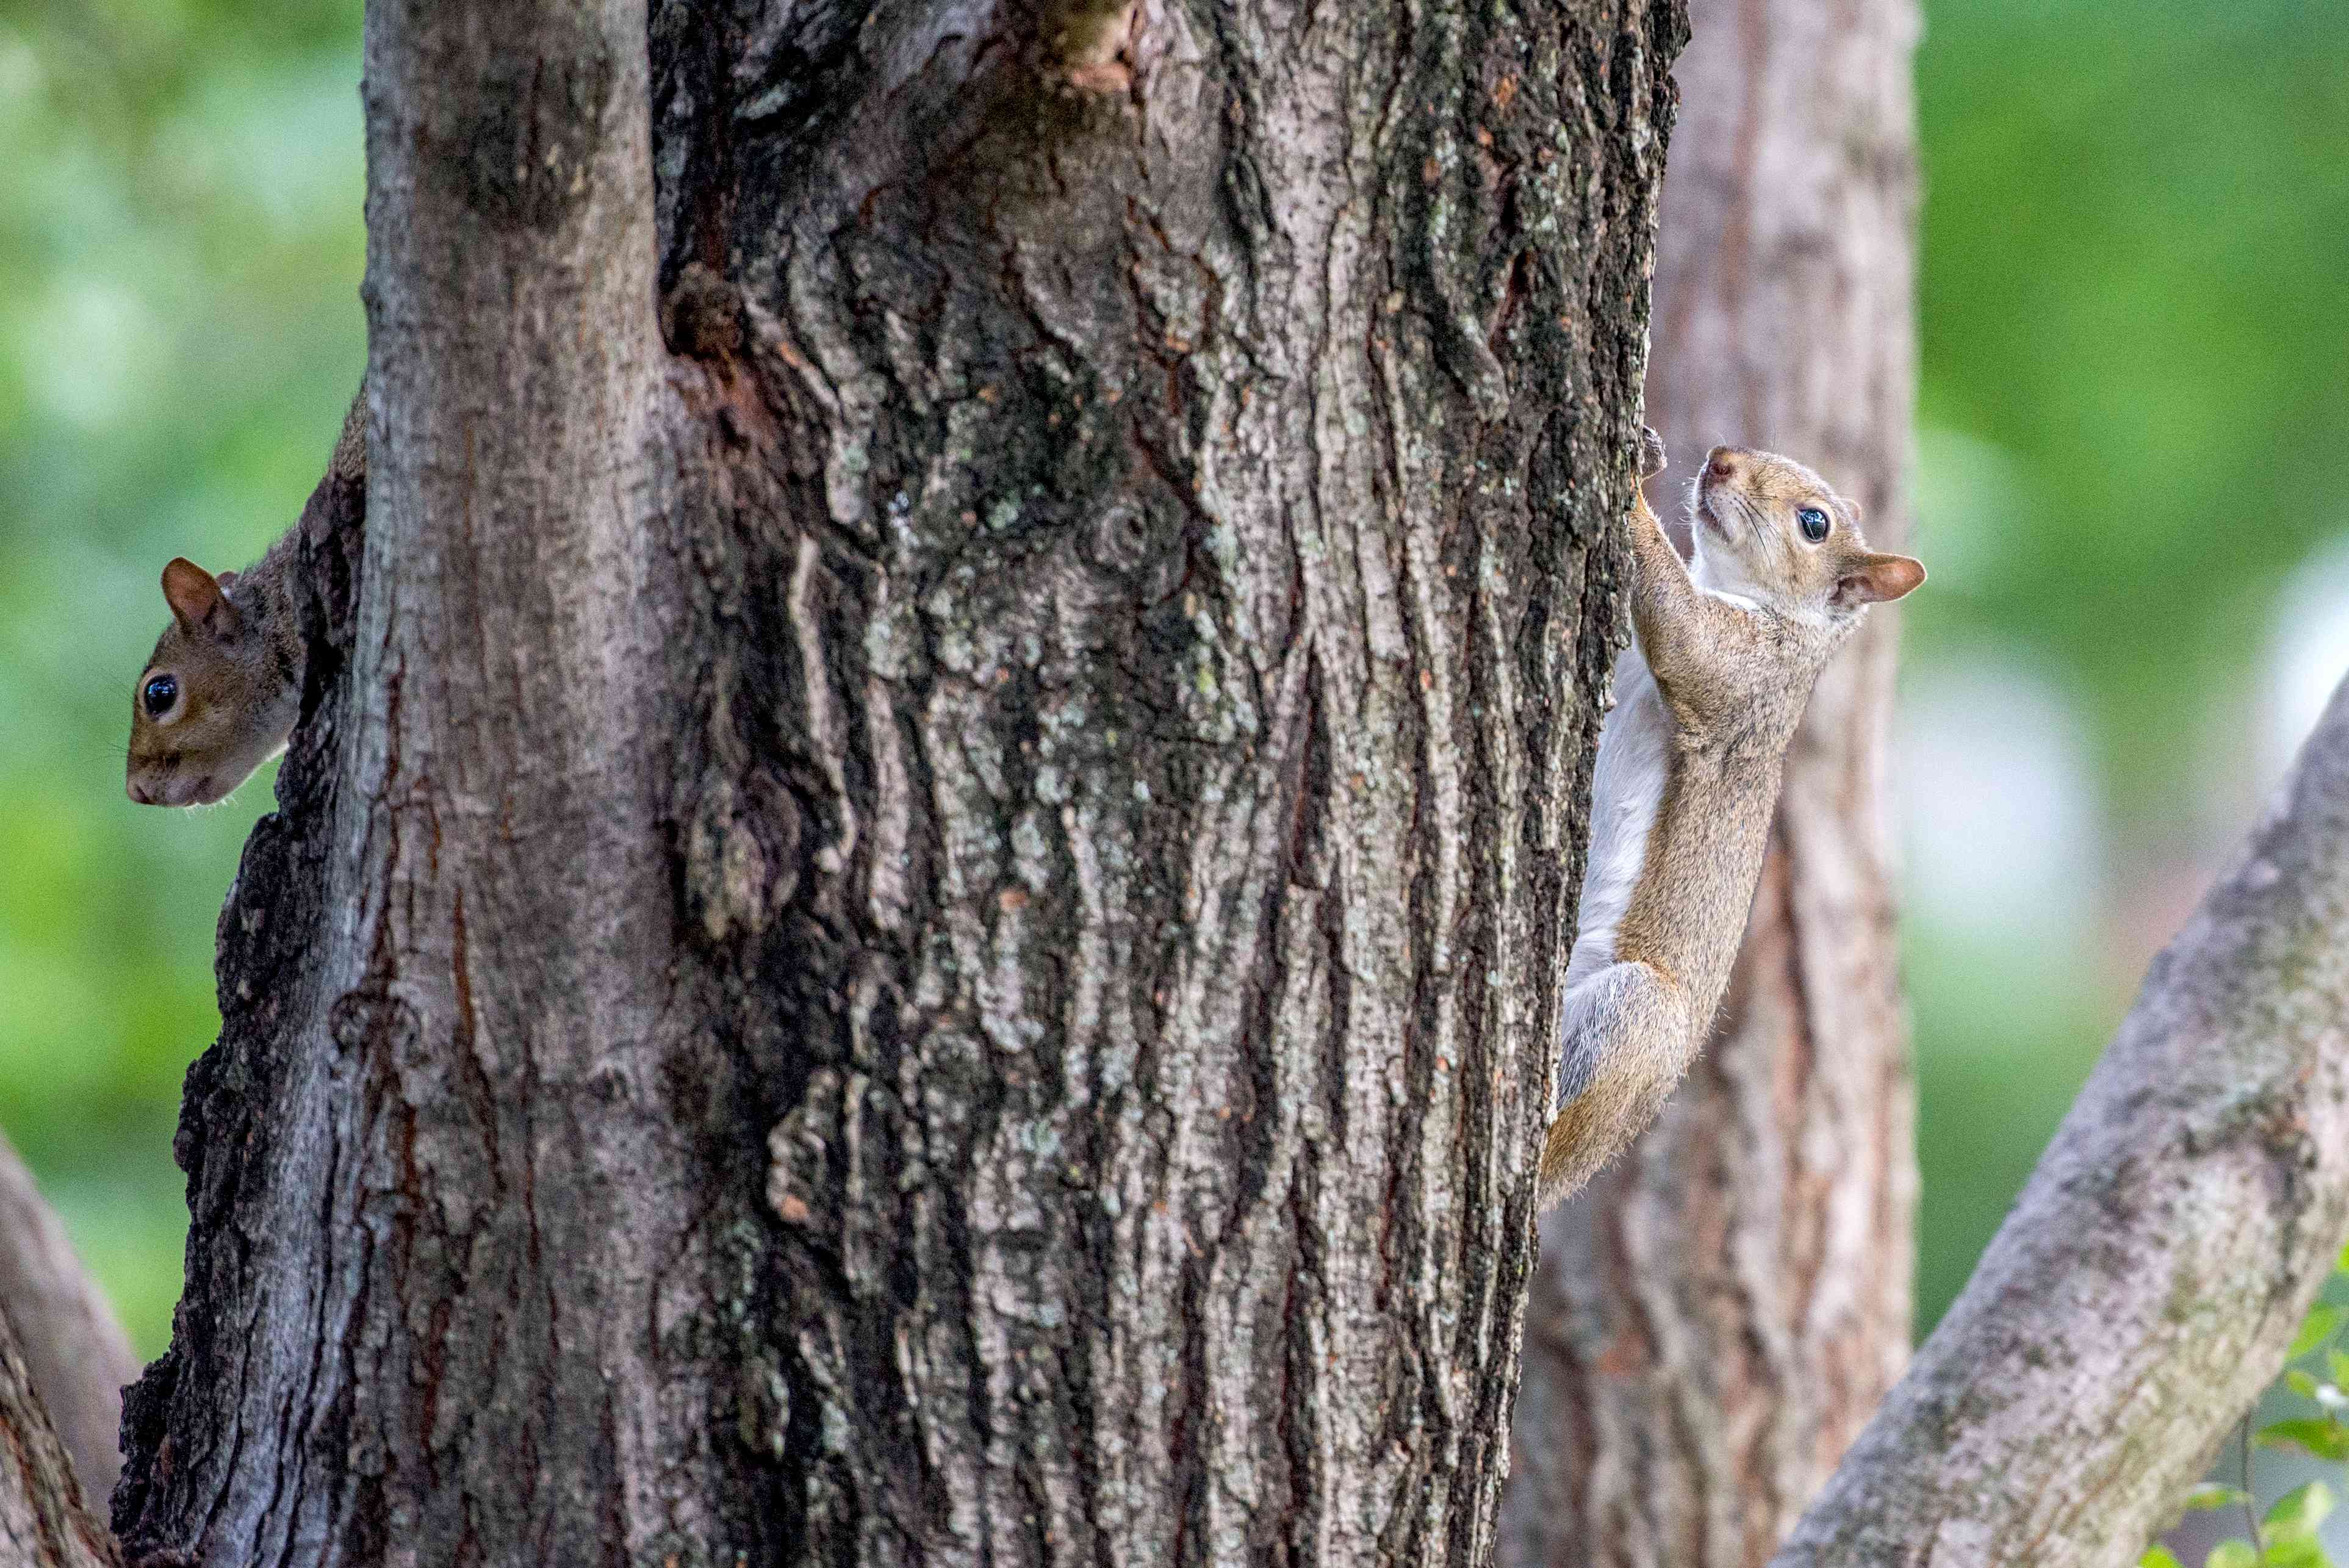 squirrels climbing a tree